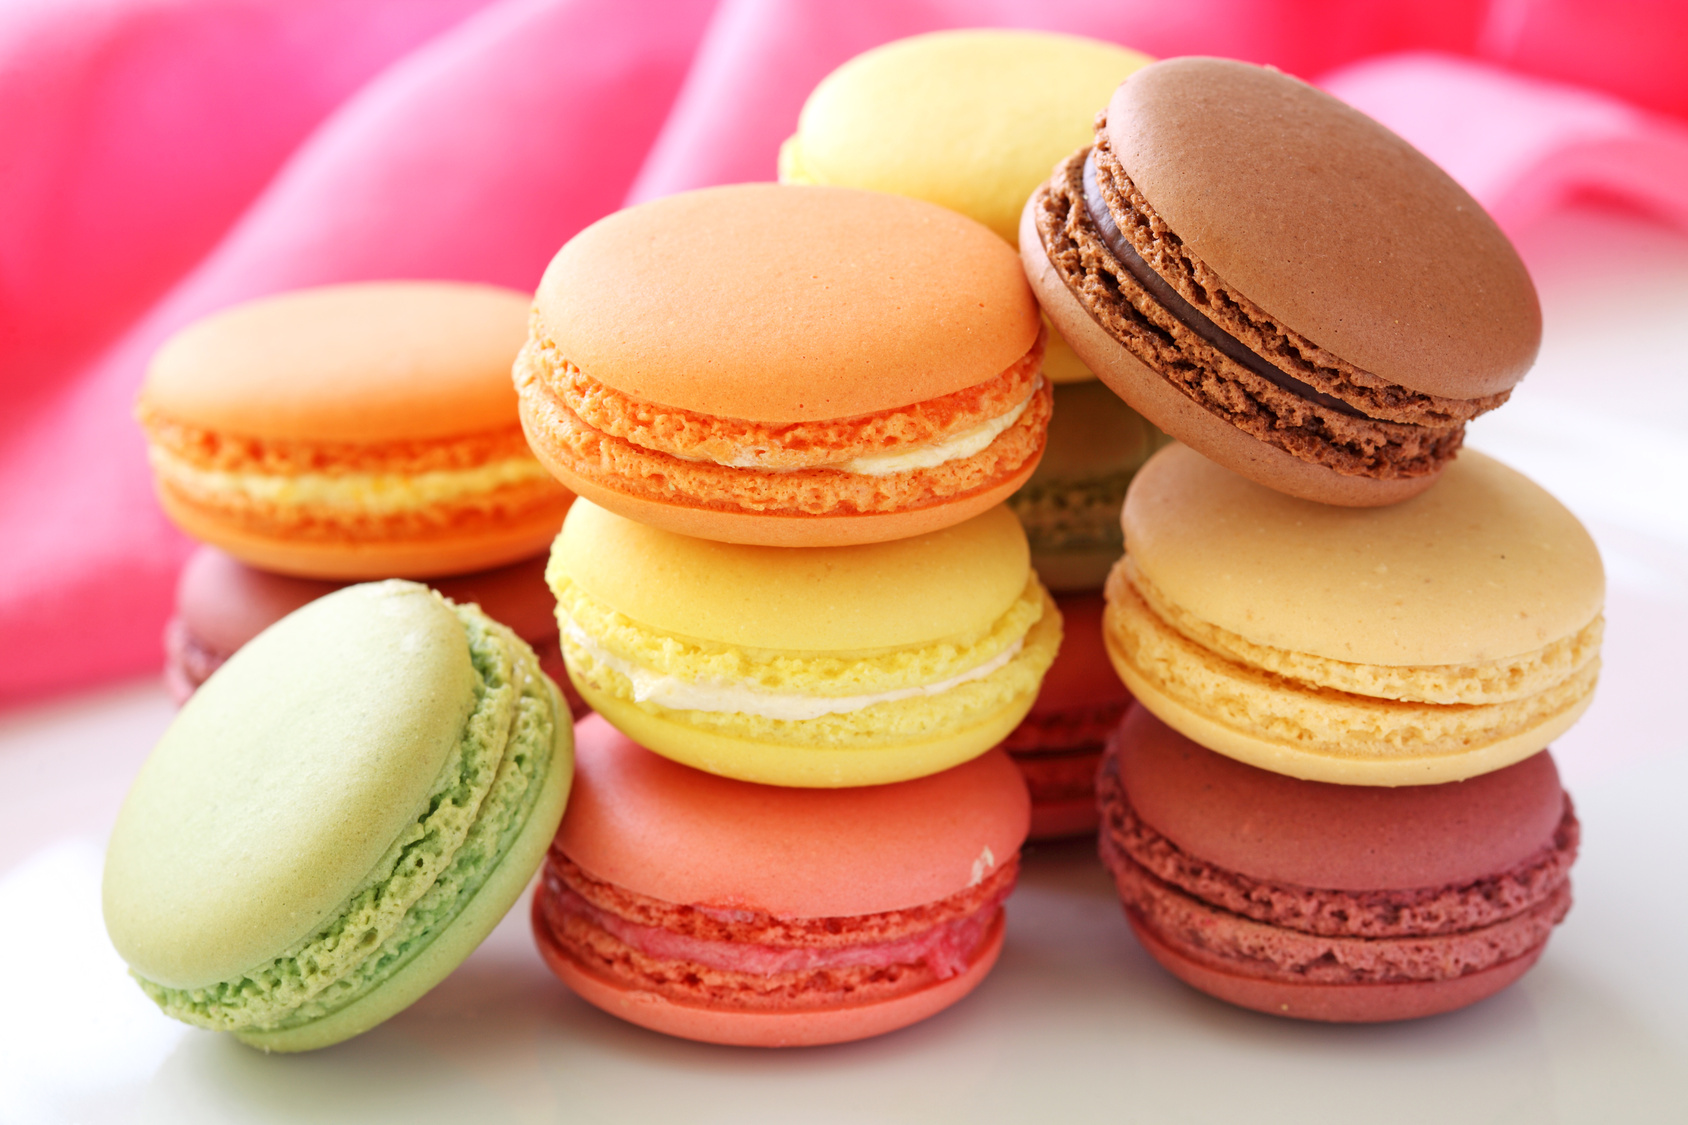 French Macaron Image